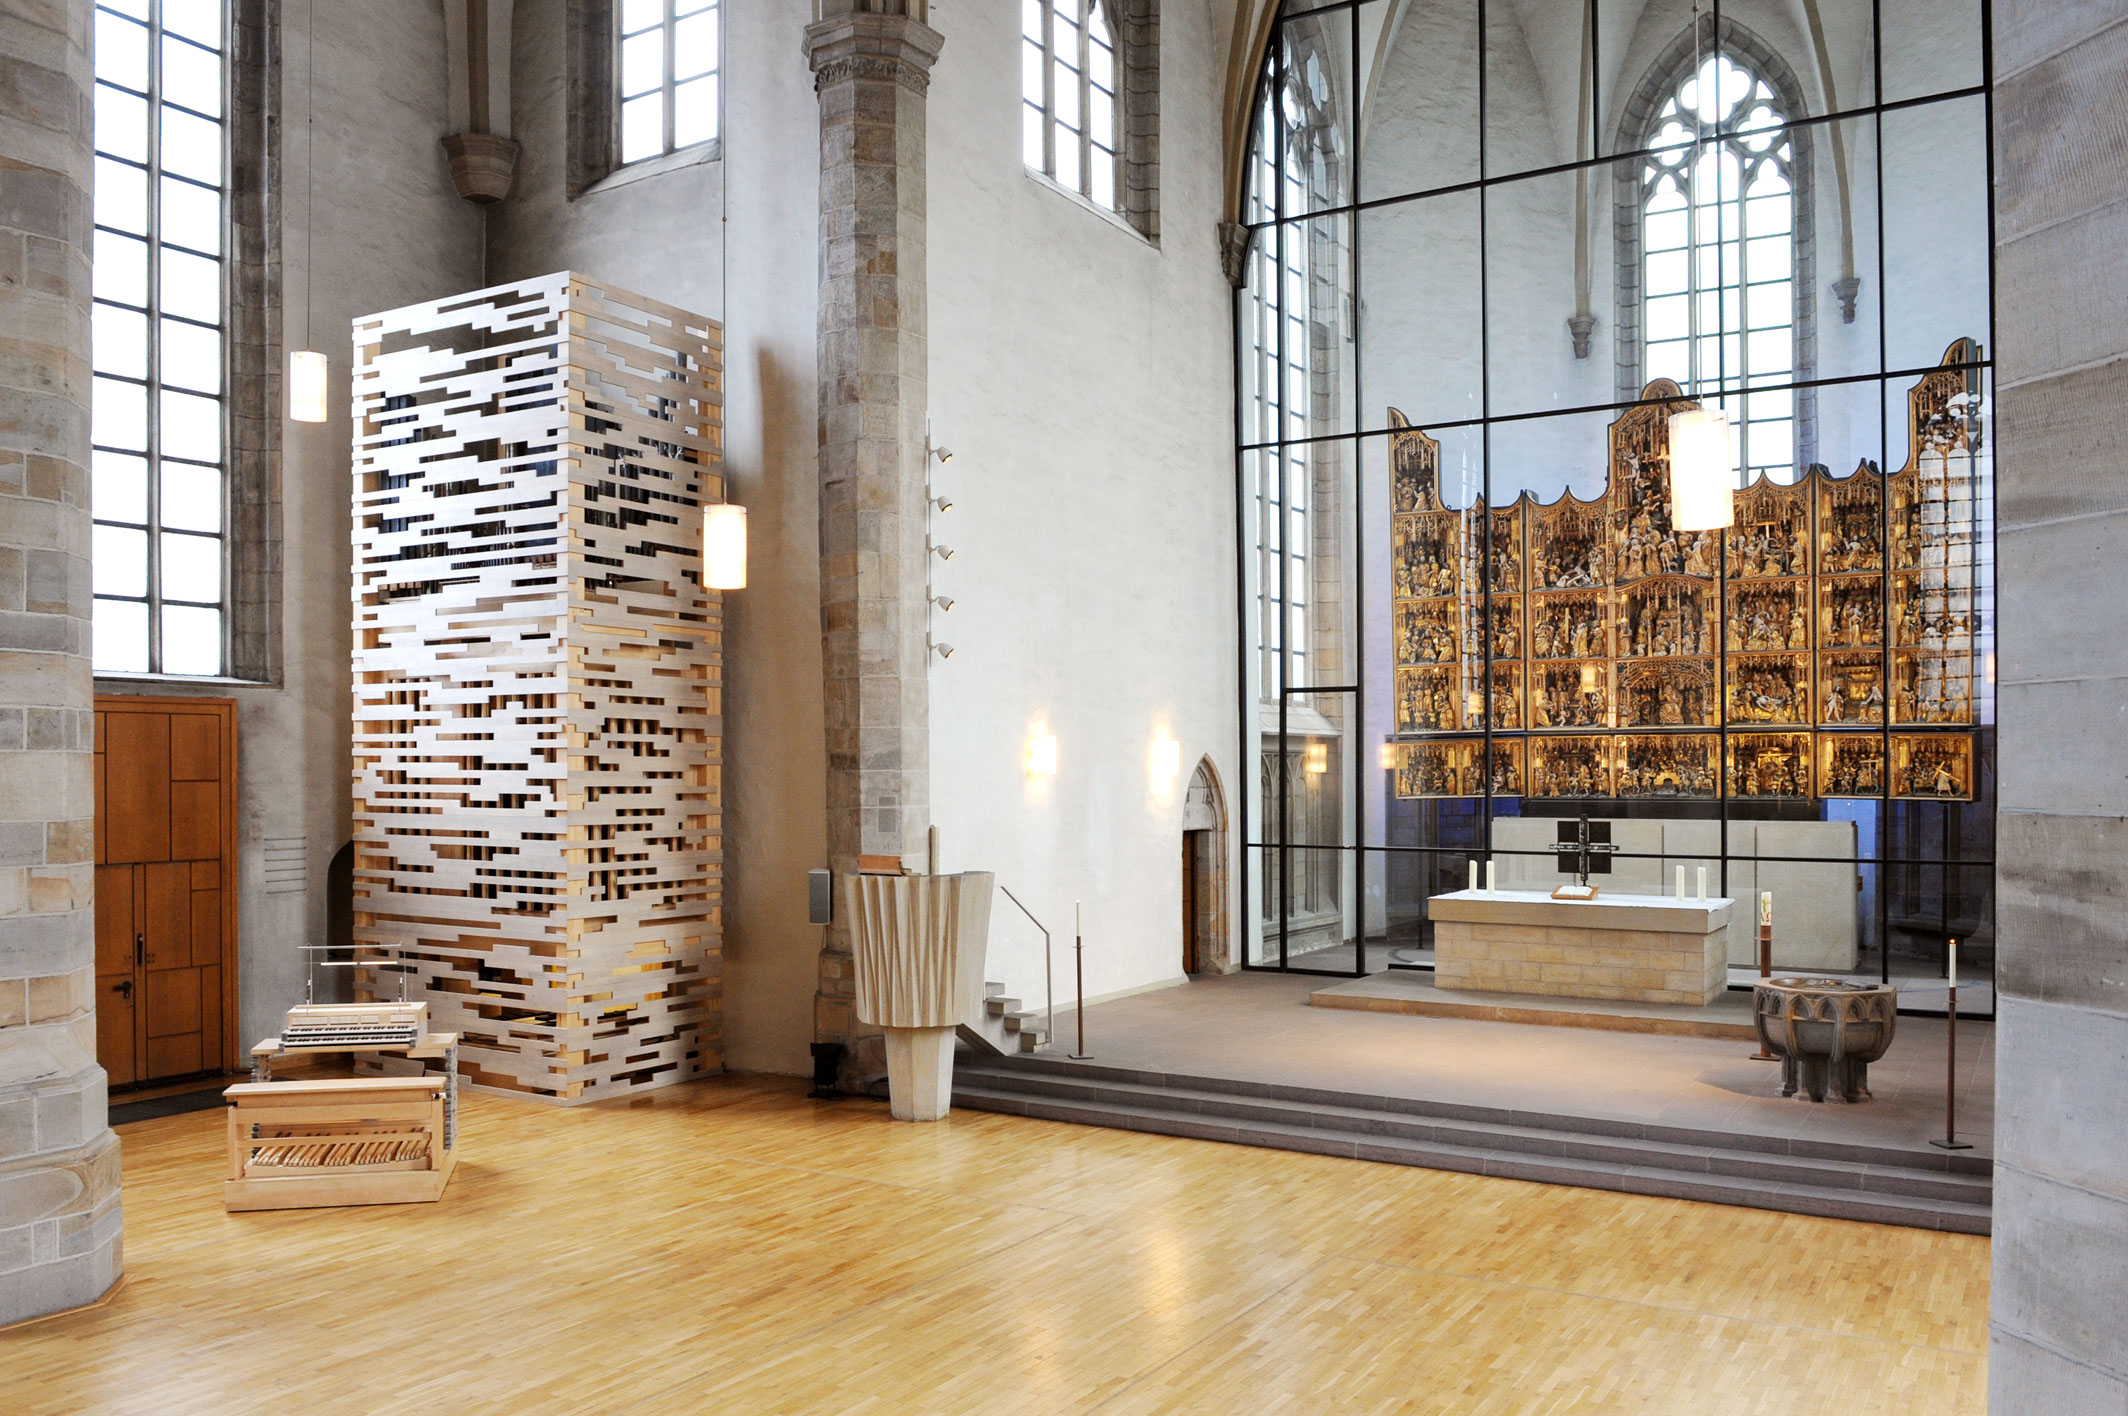 Ev. Stadtkirche St. Petri, Dortmund